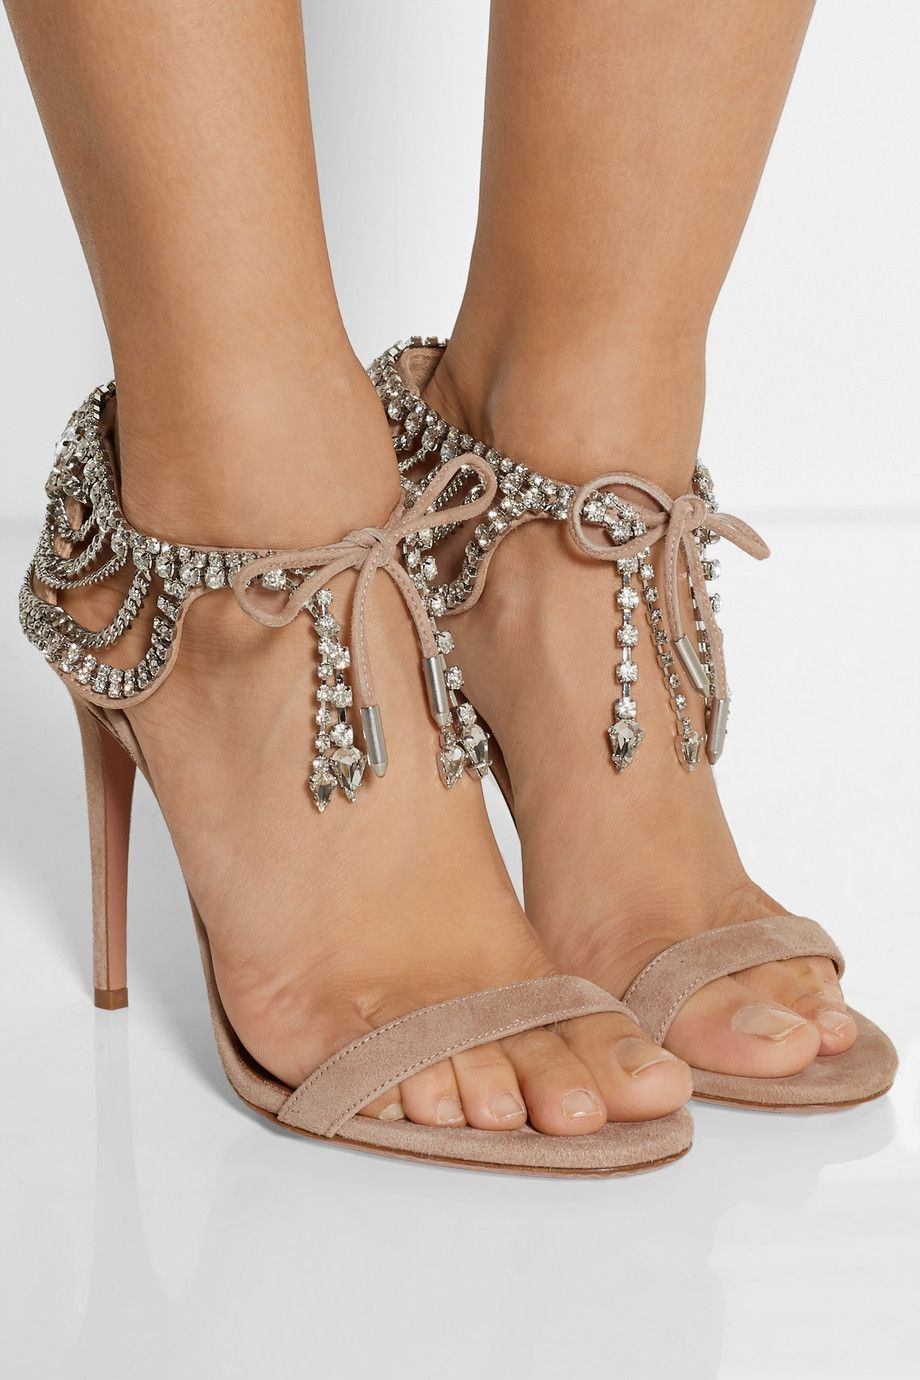 Aquazzura | Schuhe, Seele und Brautkleid